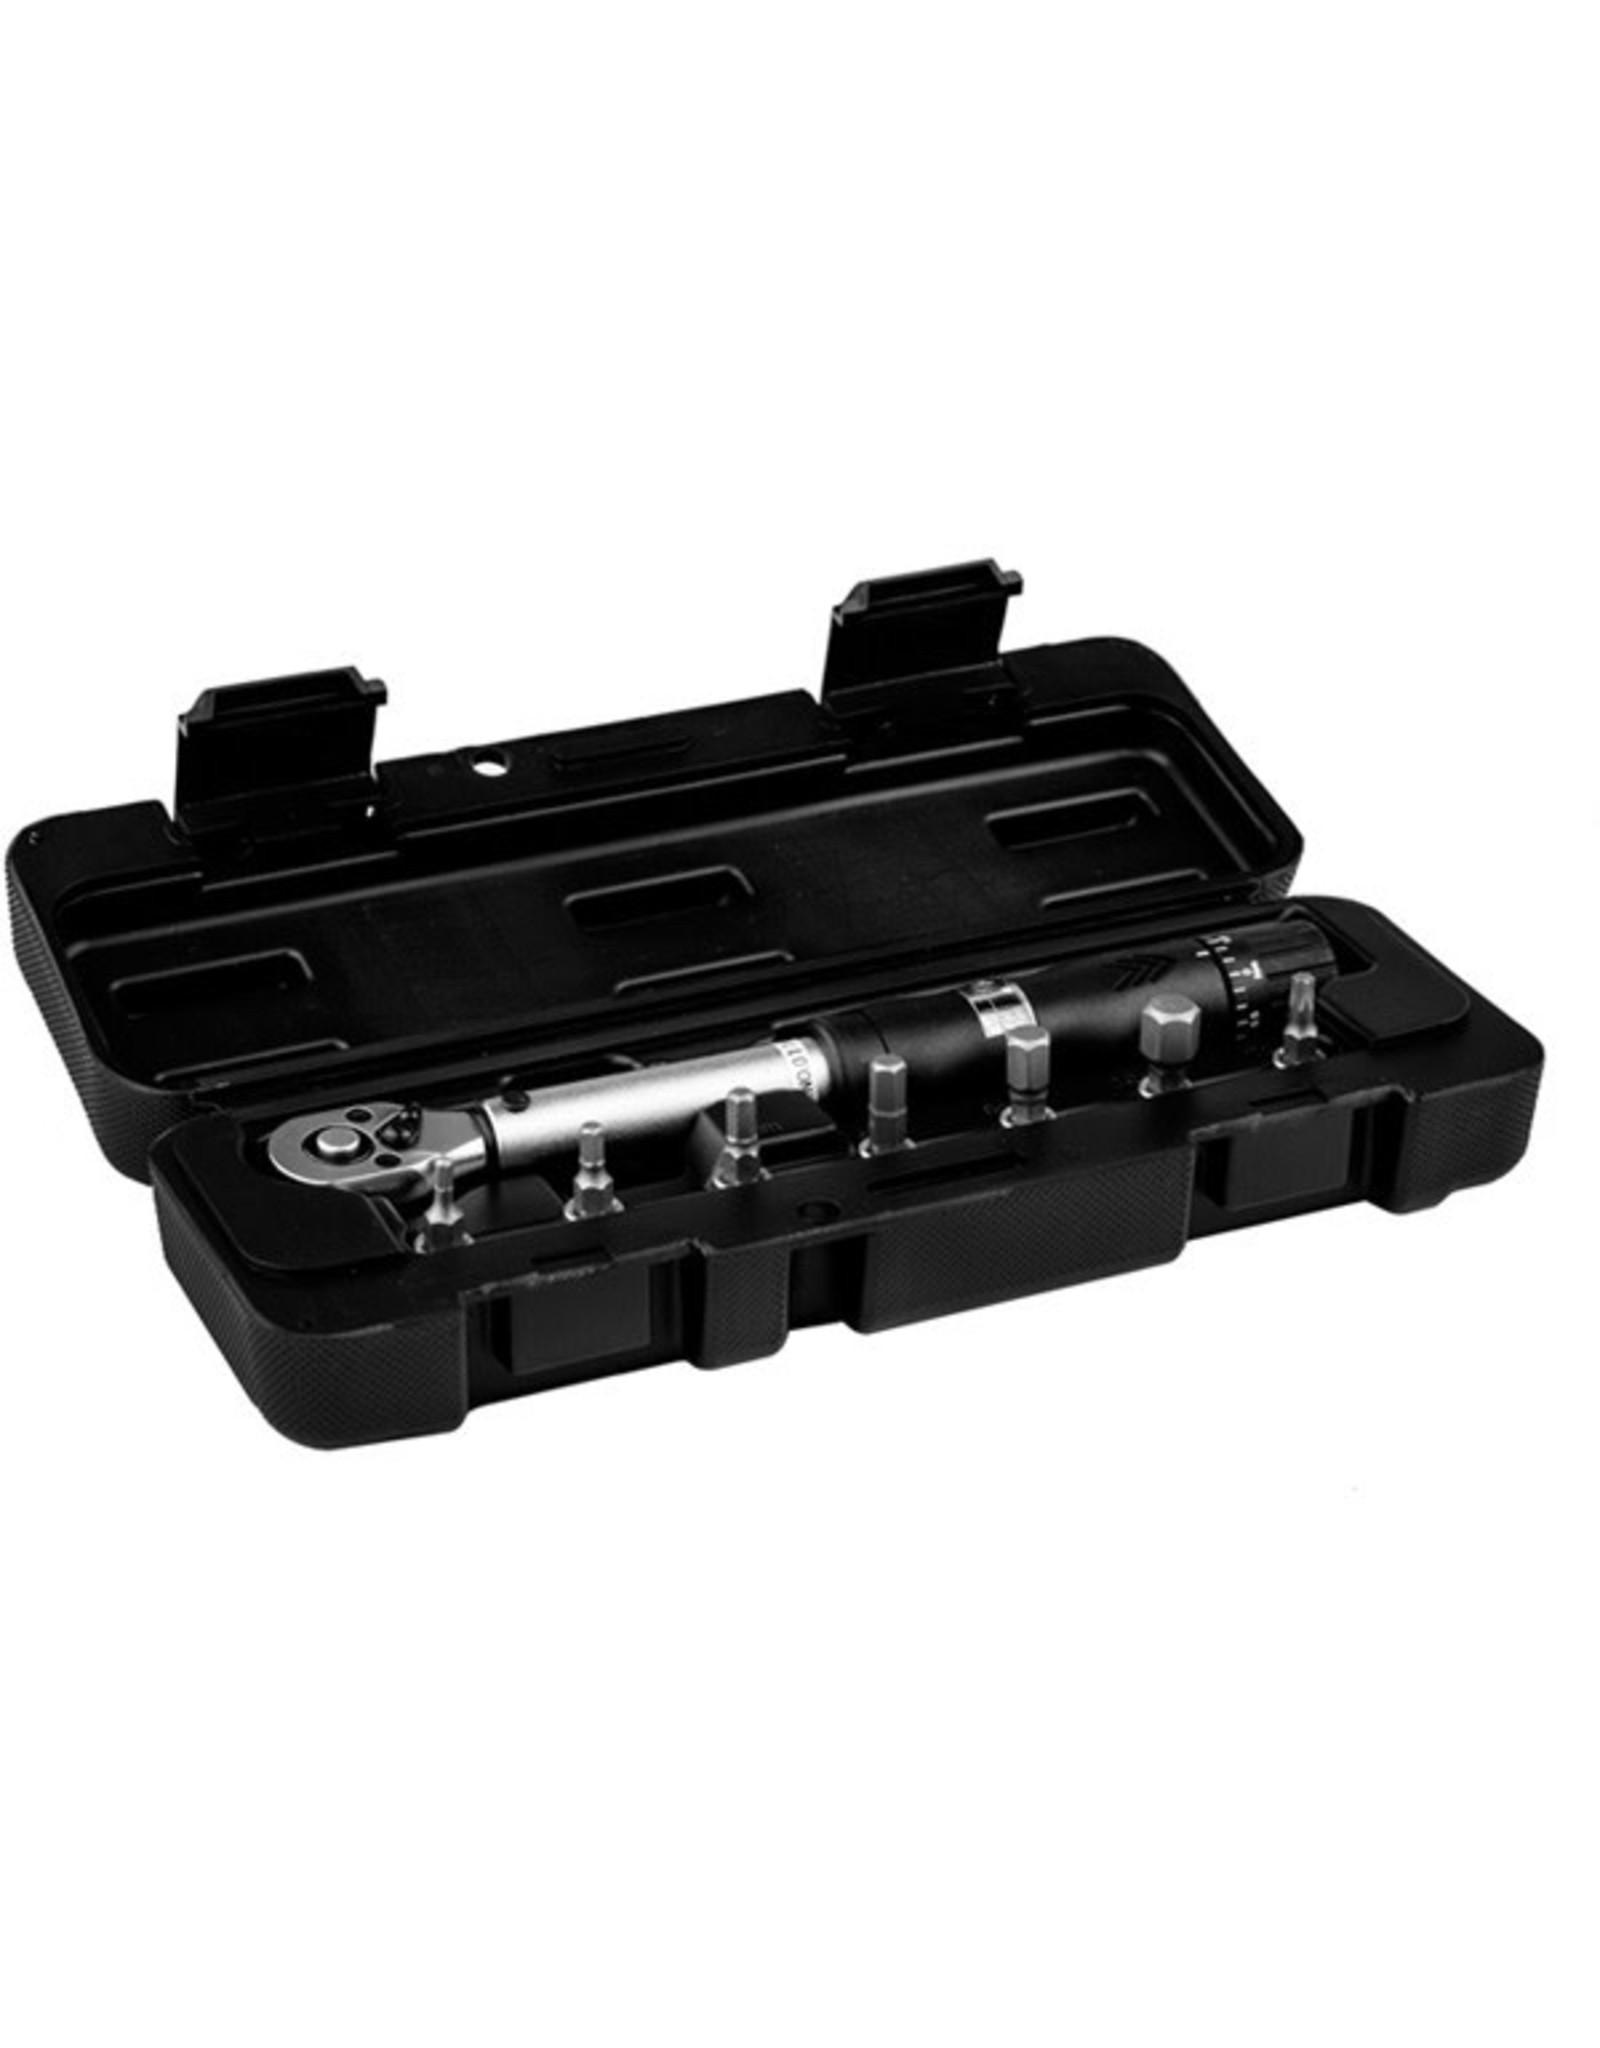 Madison Torque Wrench 3-15nm